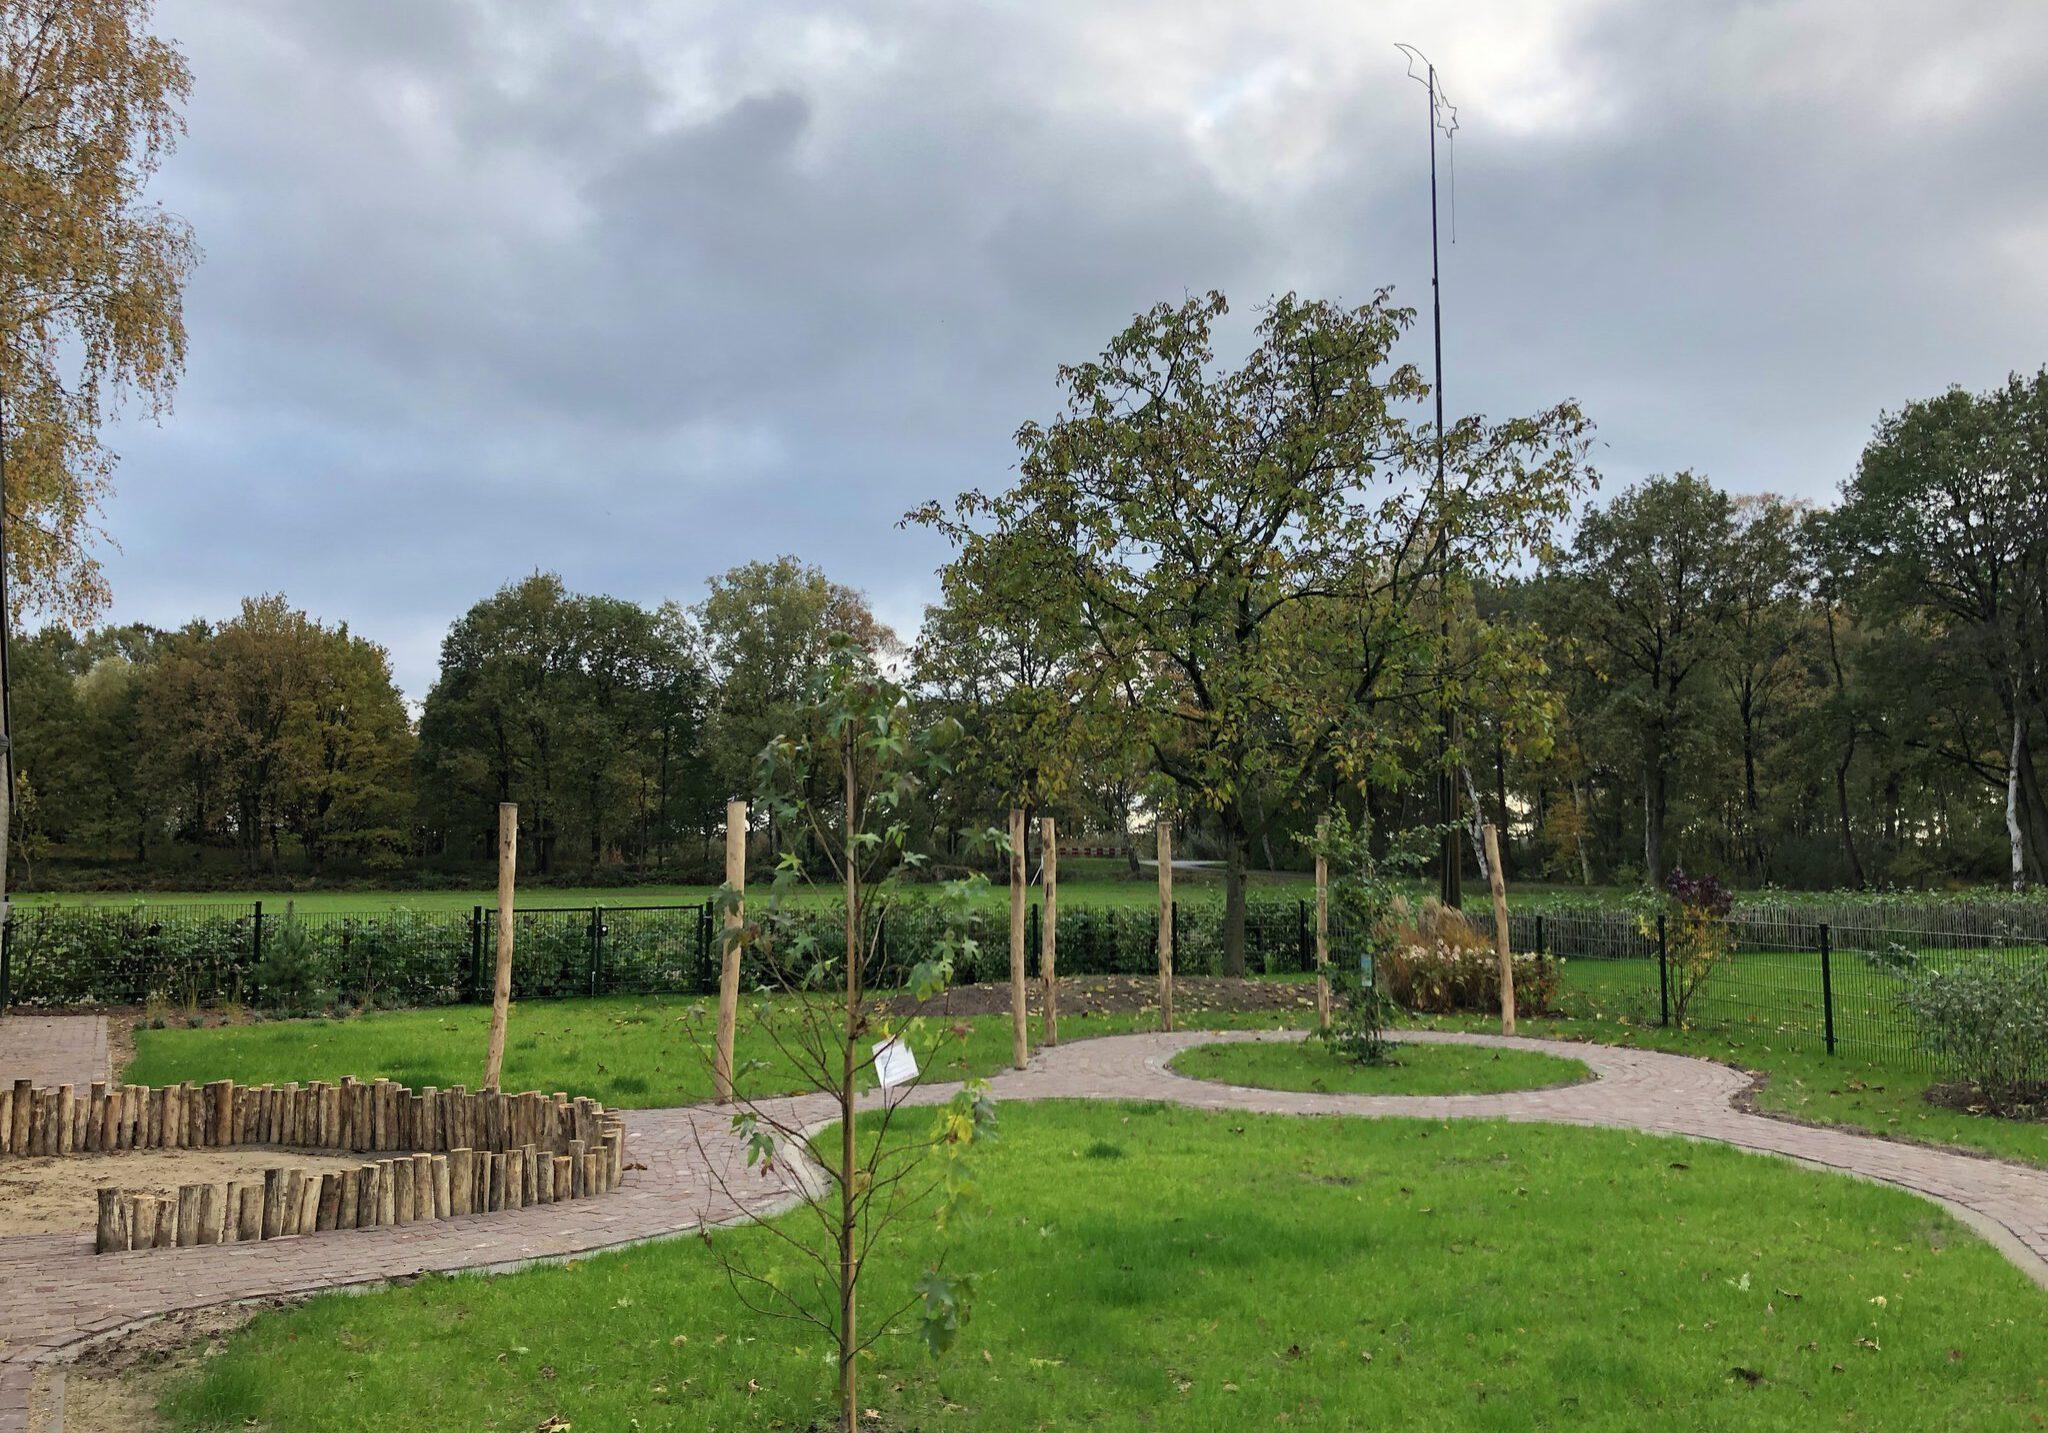 Kinderopvang Krakenburg buiten tuin